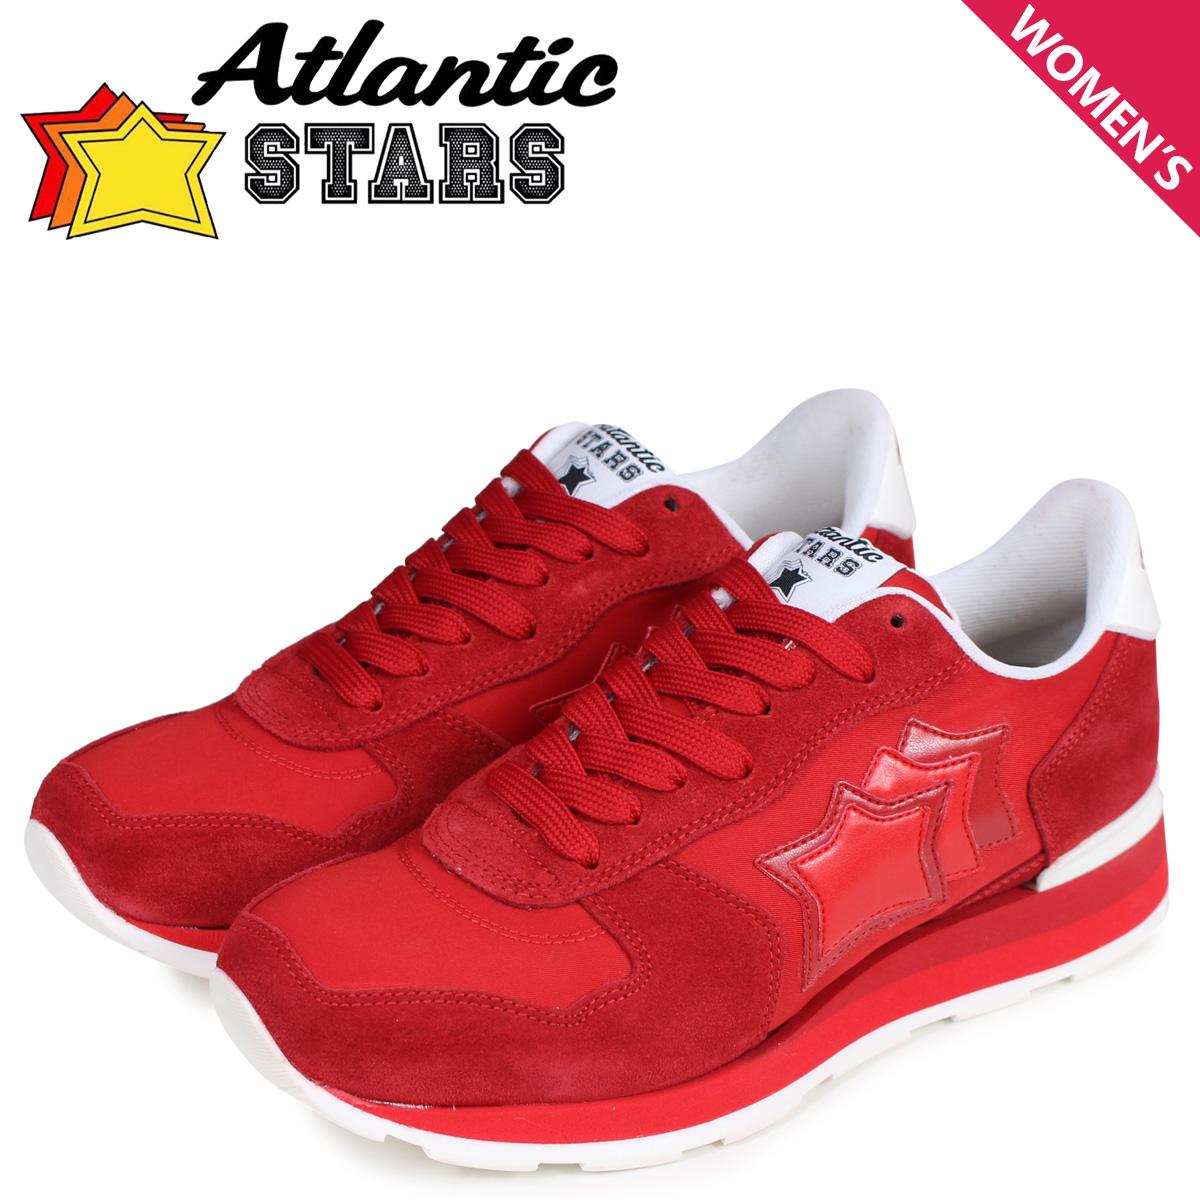 Atlantic STARS アトランティックスターズ ベガ スニーカー レディース VEGA レッド RBR-17B